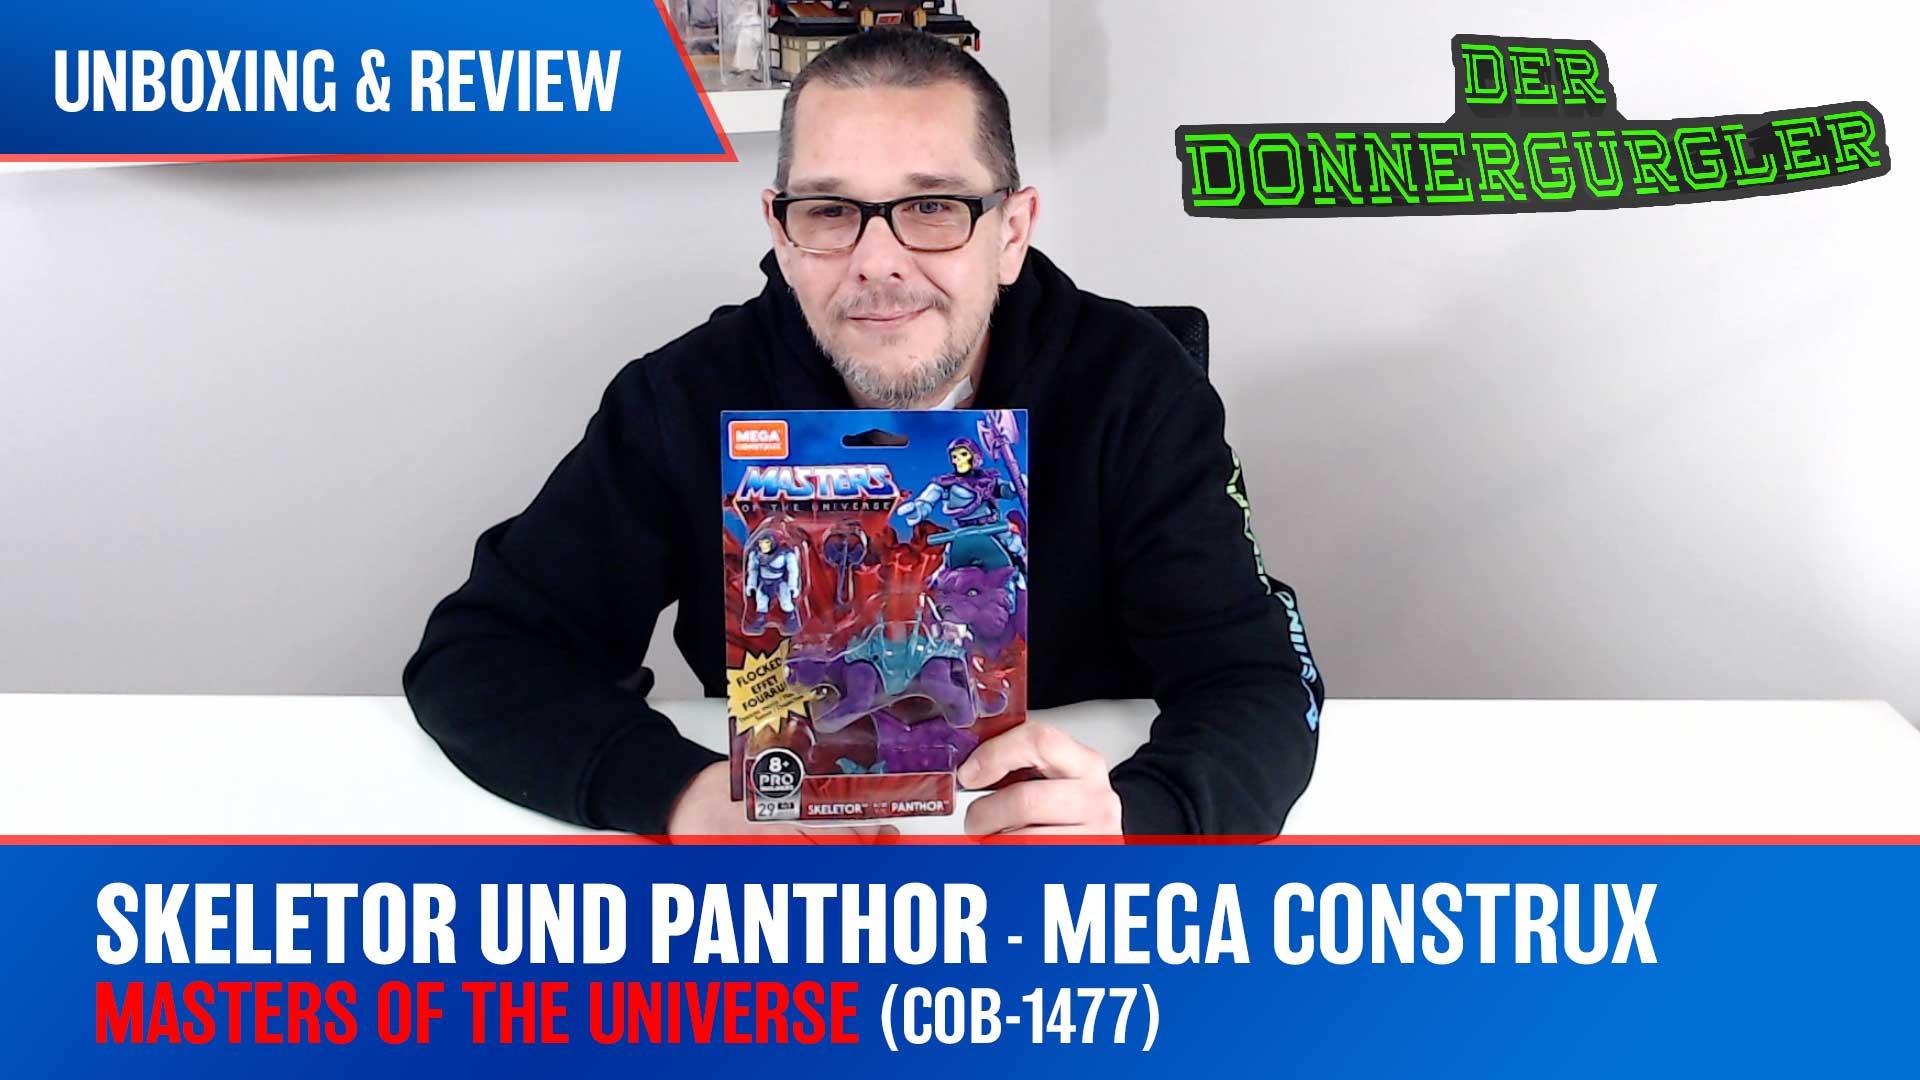 MOTU - Mega Construx Skeletor und Panthor (Mega GVY17)